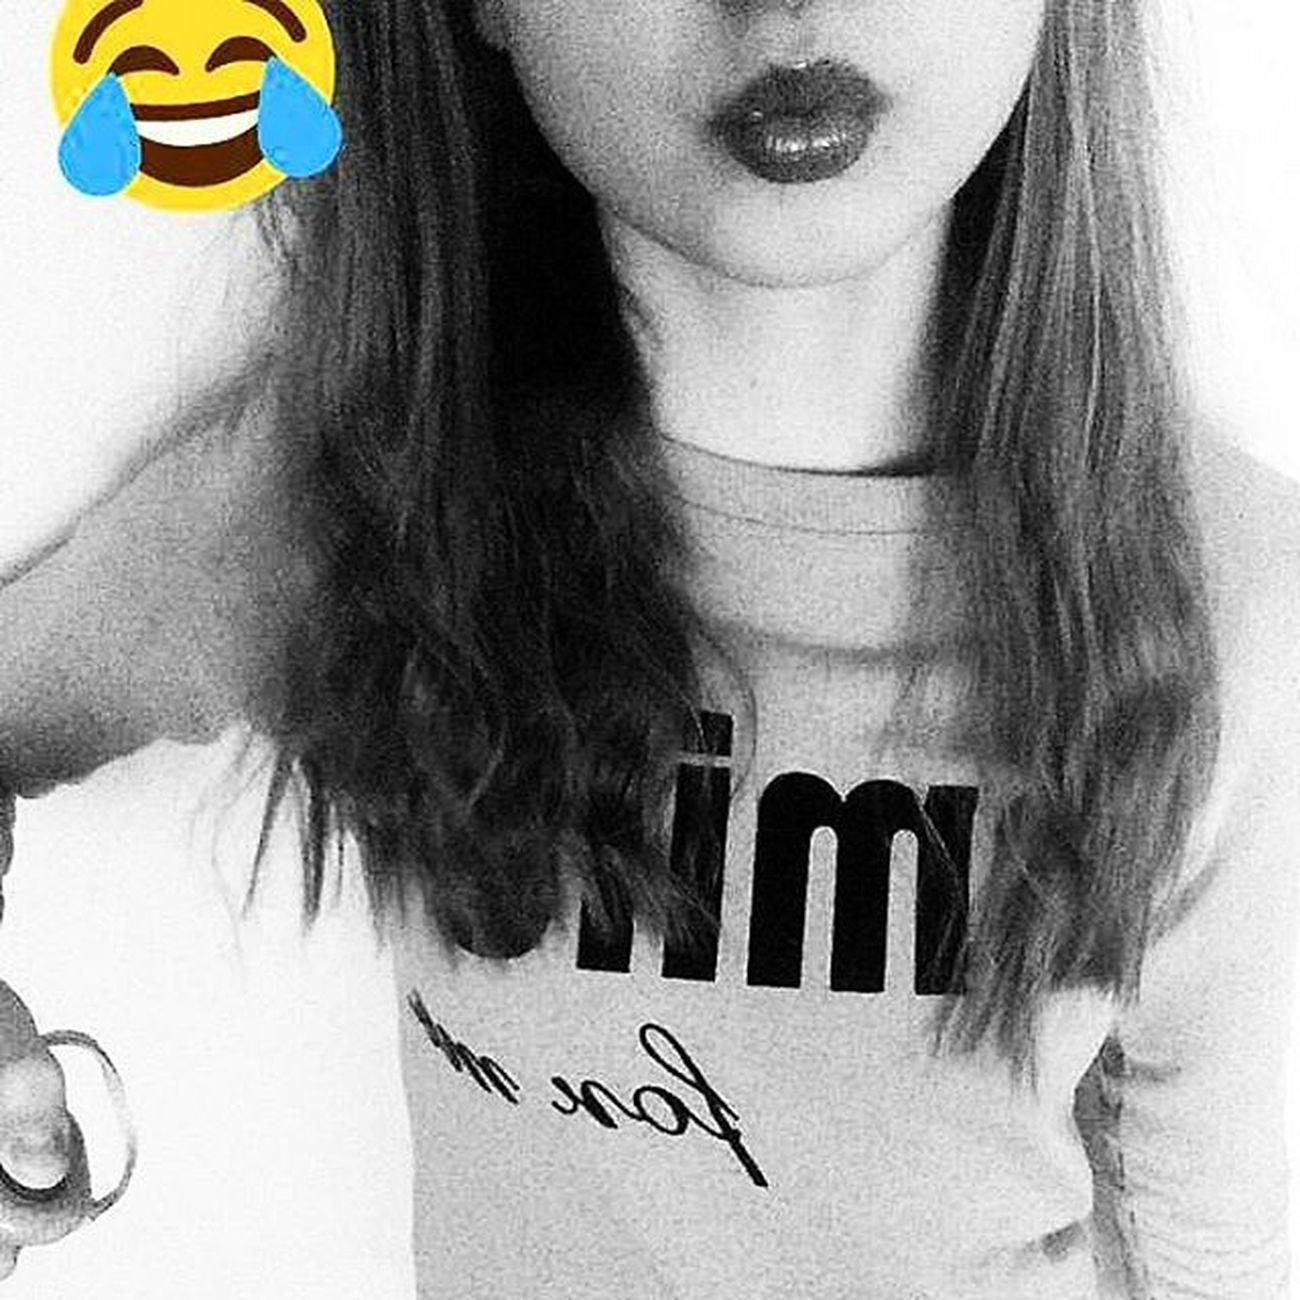 Selfie Selfiexd Instaselfie Instagirl Instalike Instatime Instagood Me Ja F4F L4l Followforfollow Likeforlike Follow4f Like4l Followmepleasenow